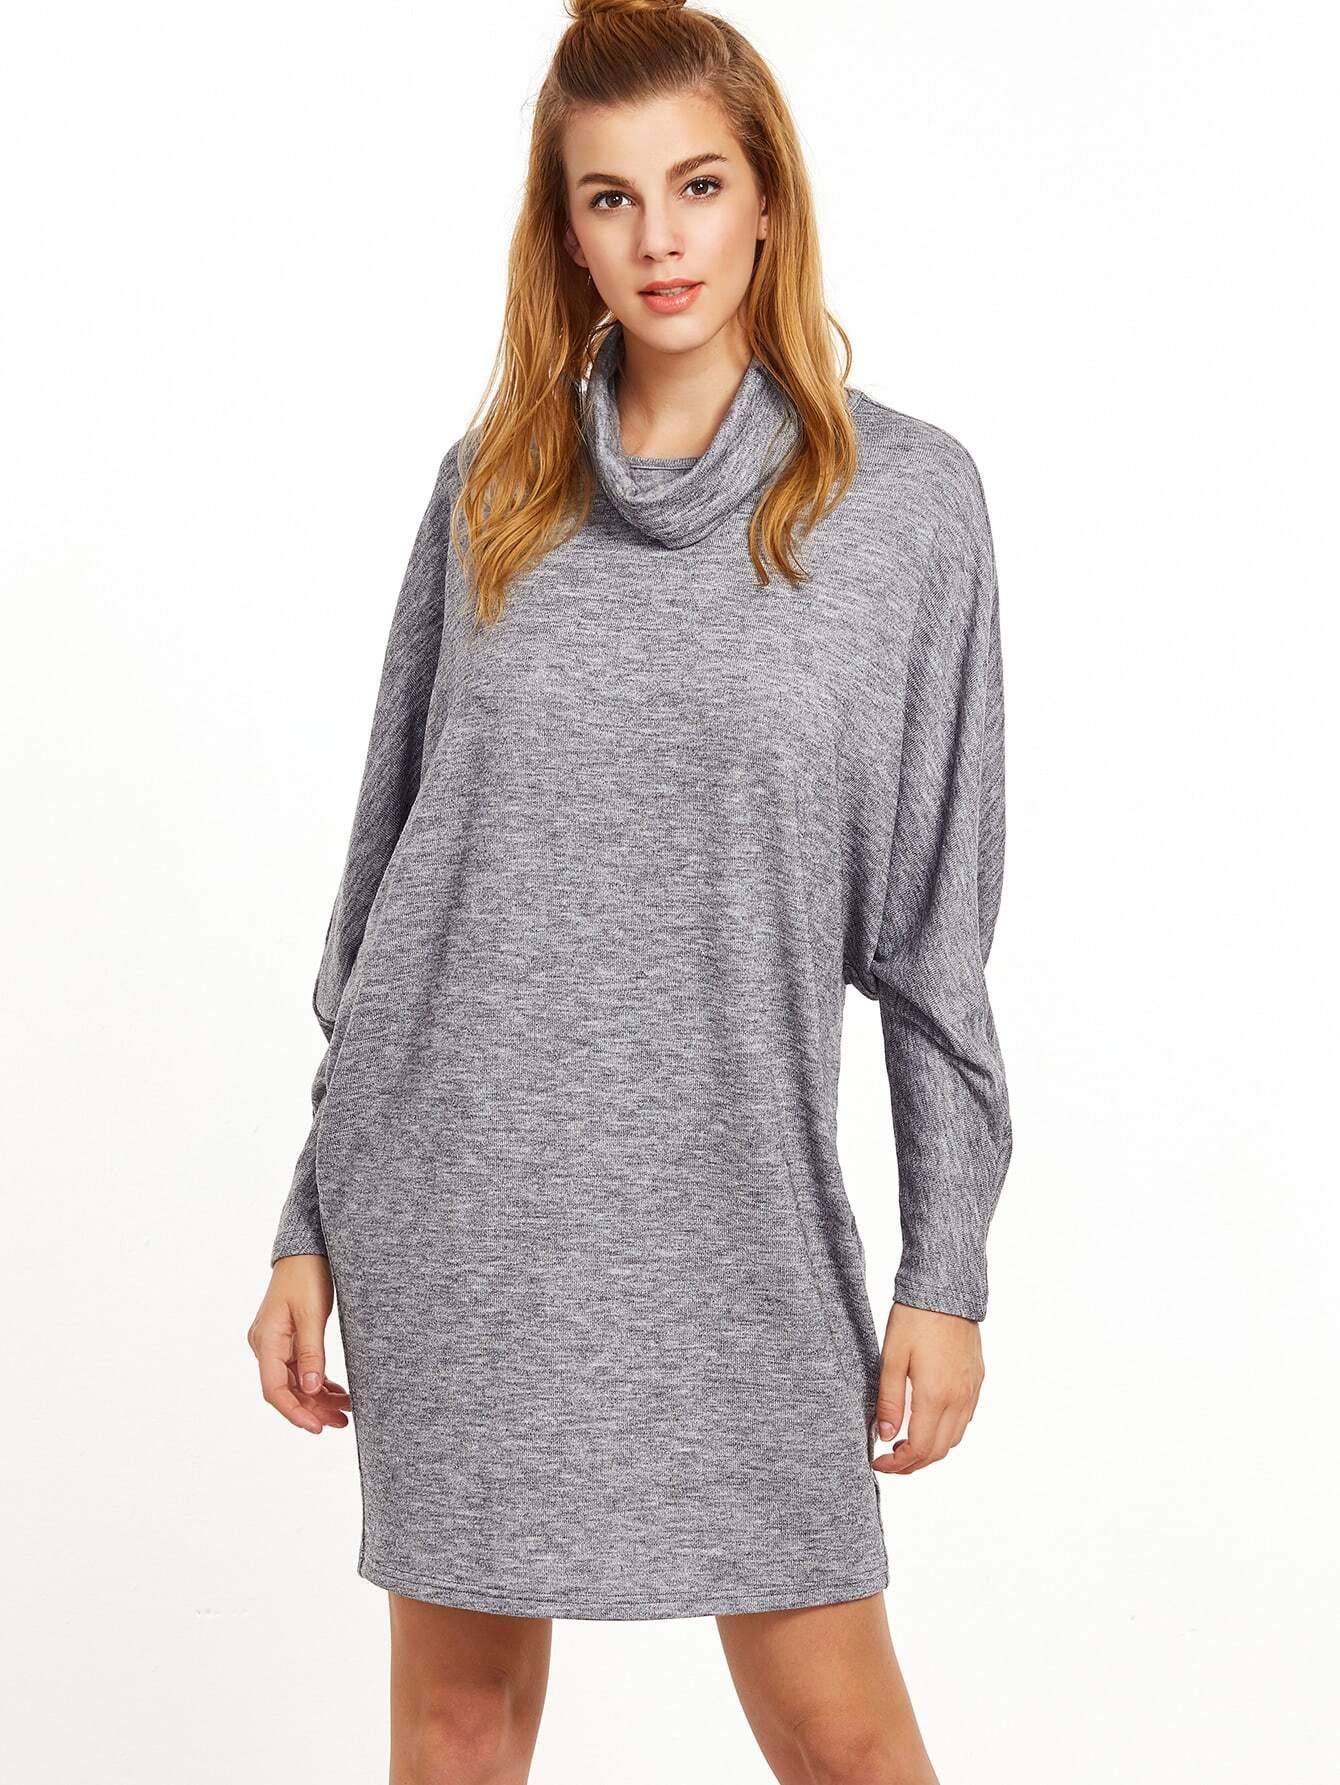 Heather Grey Cutout Cowl Neck Dolman Sleeve DressHeather Grey Cutout Cowl Neck Dolman Sleeve Dress<br><br>color: Grey<br>size: L,M,S,XS